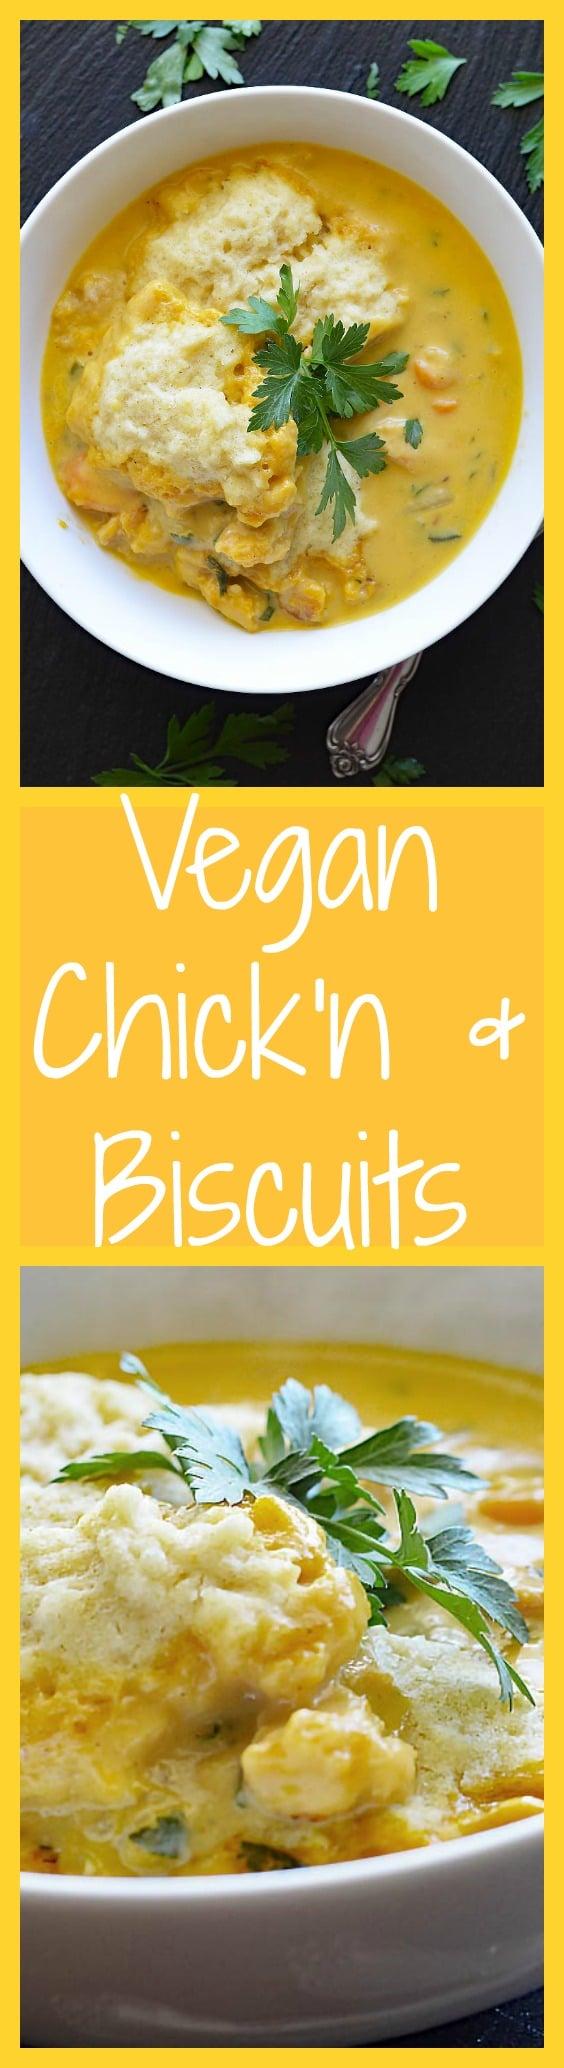 Vegan Chicken and Biscuits